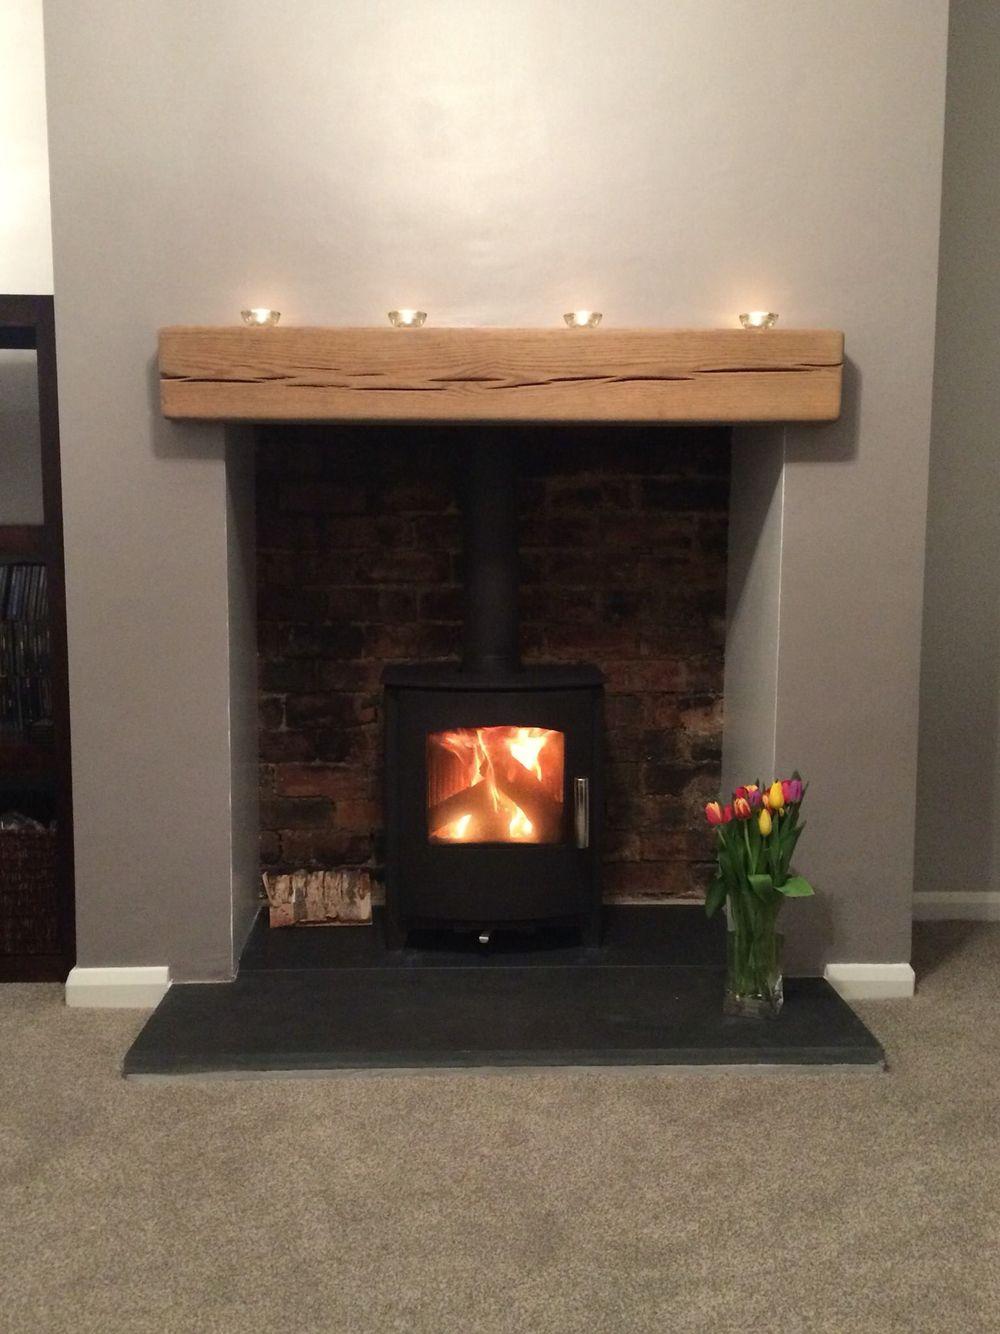 mendip churchill wood burning and multi fuel stove we. Black Bedroom Furniture Sets. Home Design Ideas